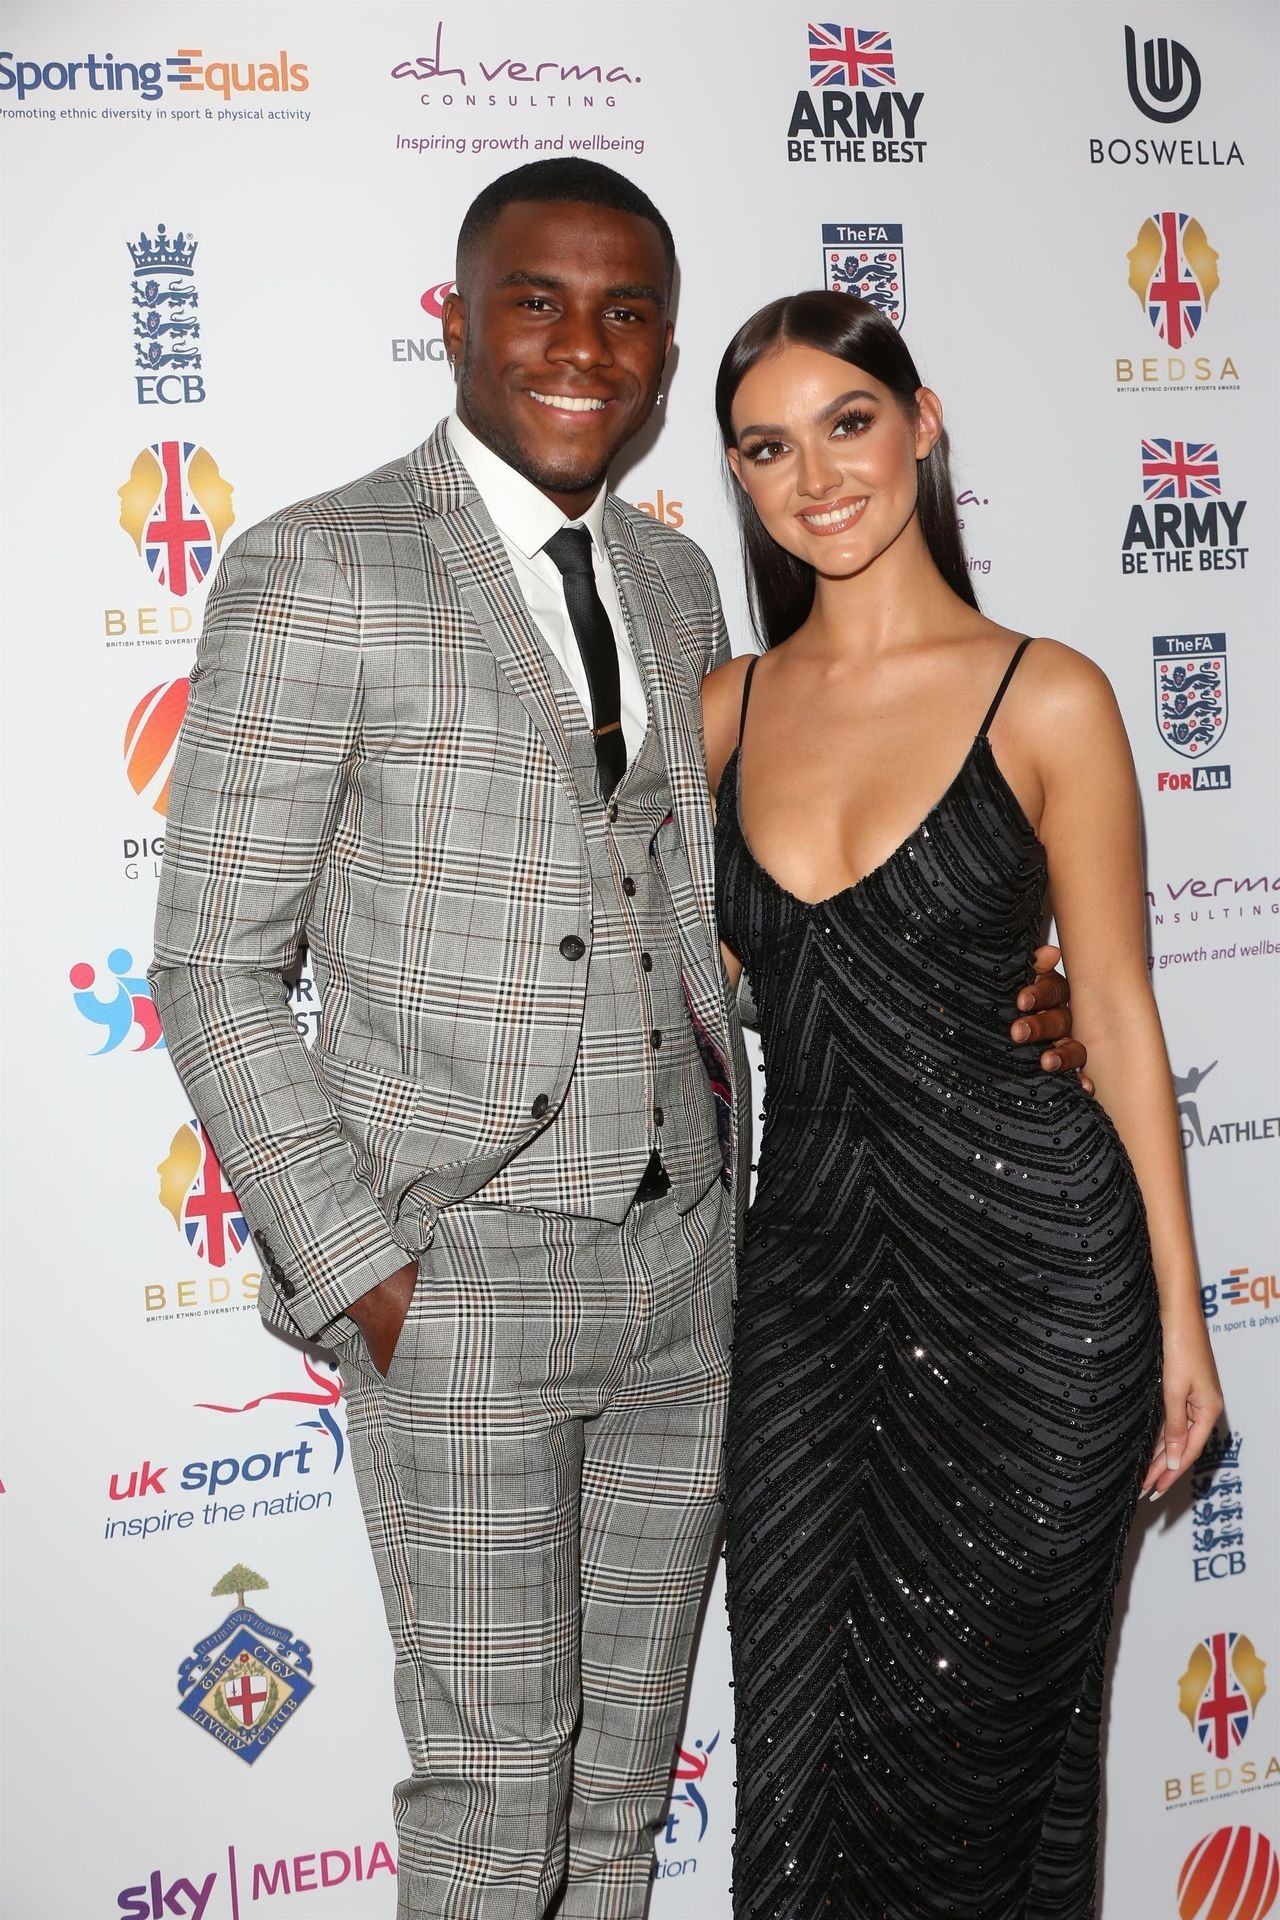 Siannise Fudge & Luke Trotman Are Seen At British Ethnic Diversity Sports Awards 0040